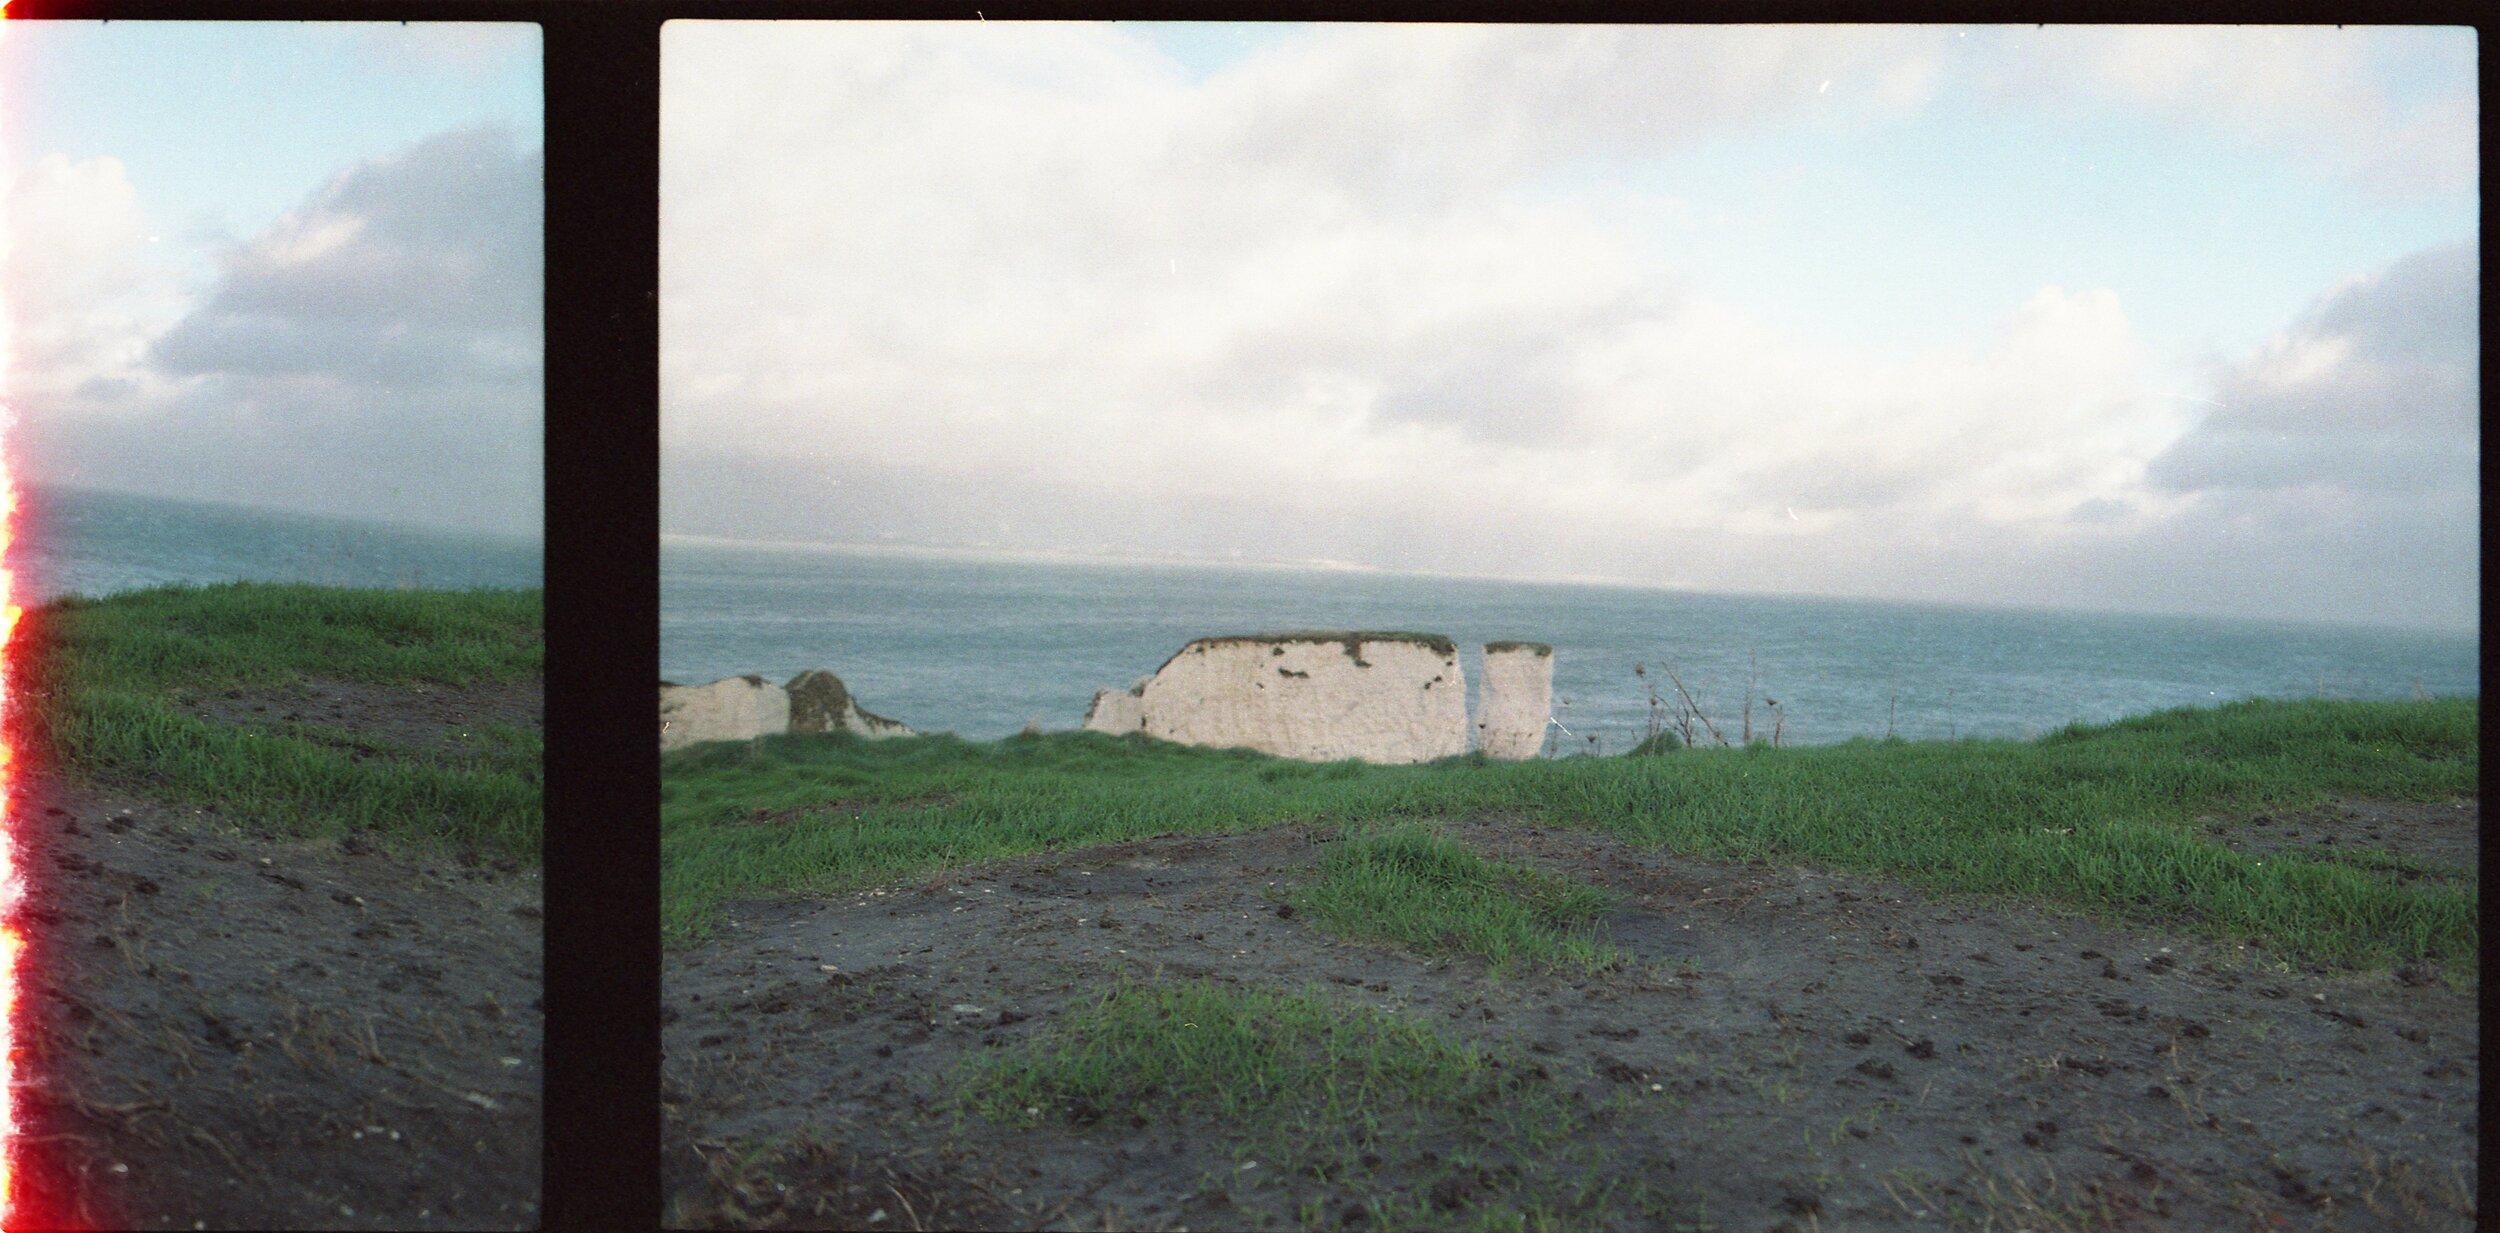 Dorset 35mm AGFA007.jpg